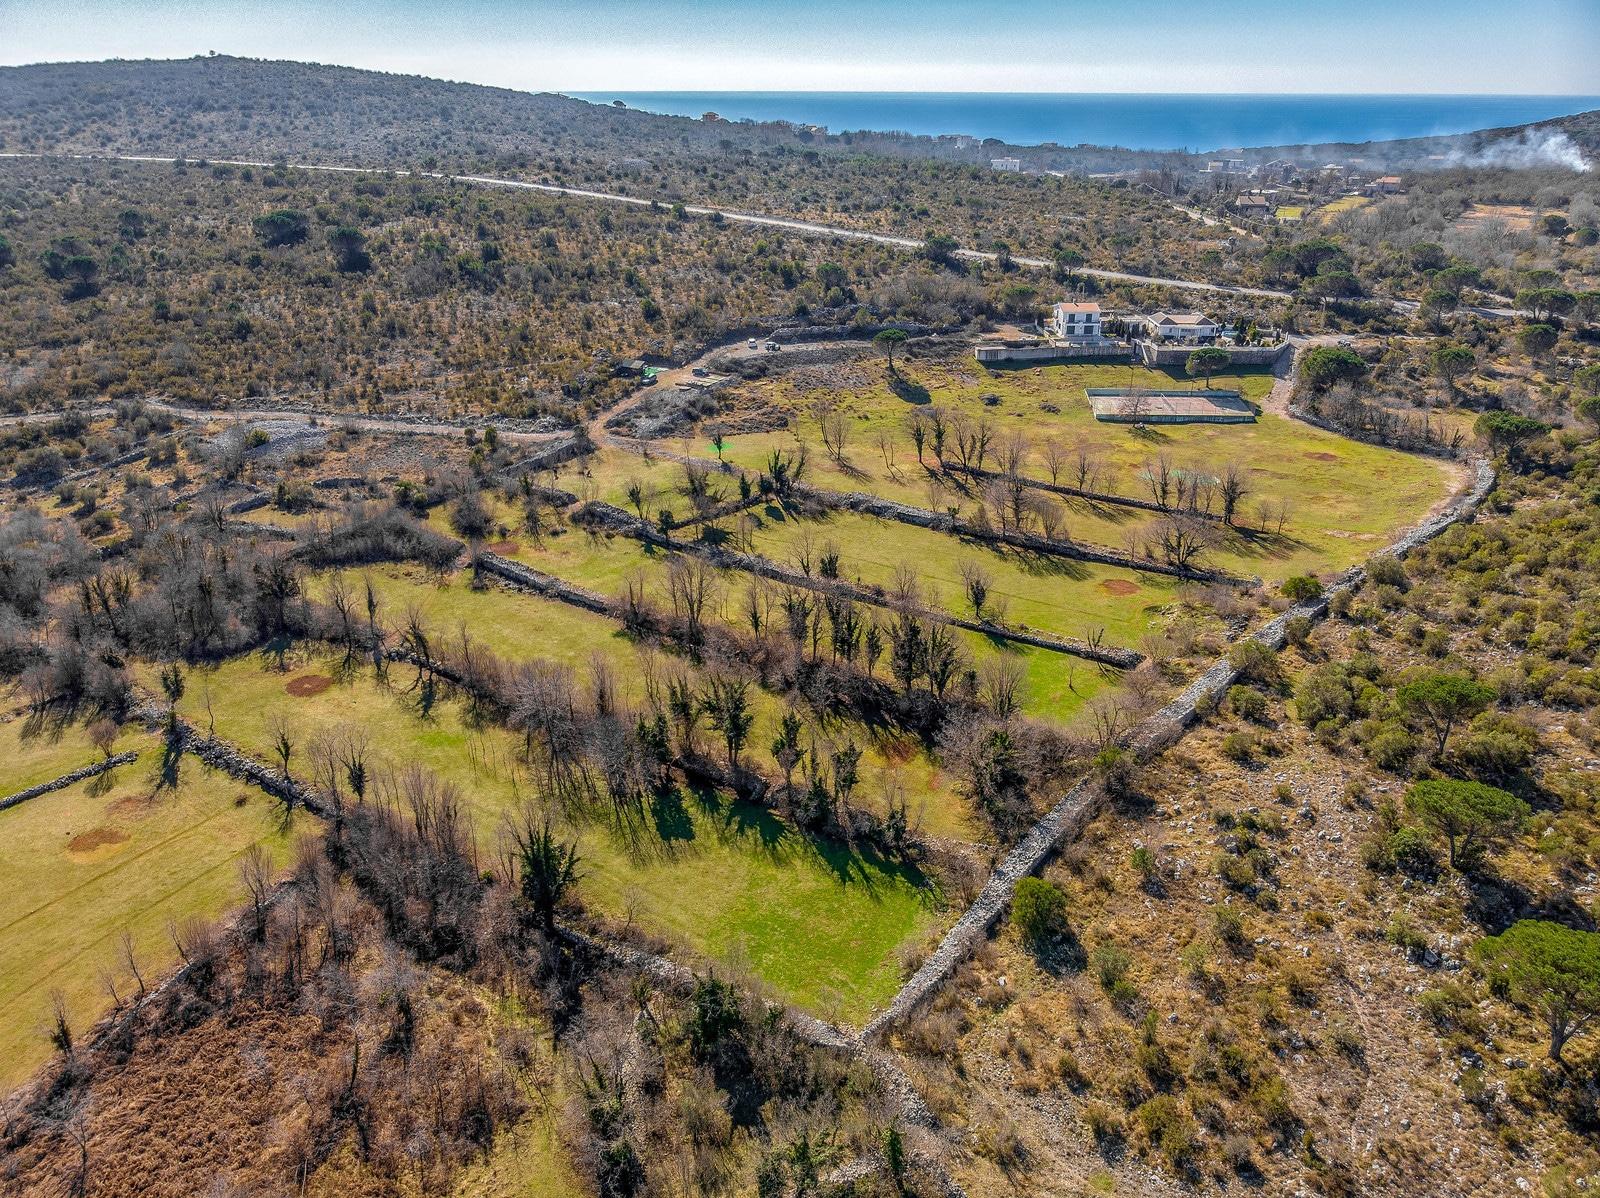 Snimak iz drona, Plac (golf teren) na Krimovici, Budva, Luxury Homes Montenegro, Profesionalni fotograf - Foto Radević